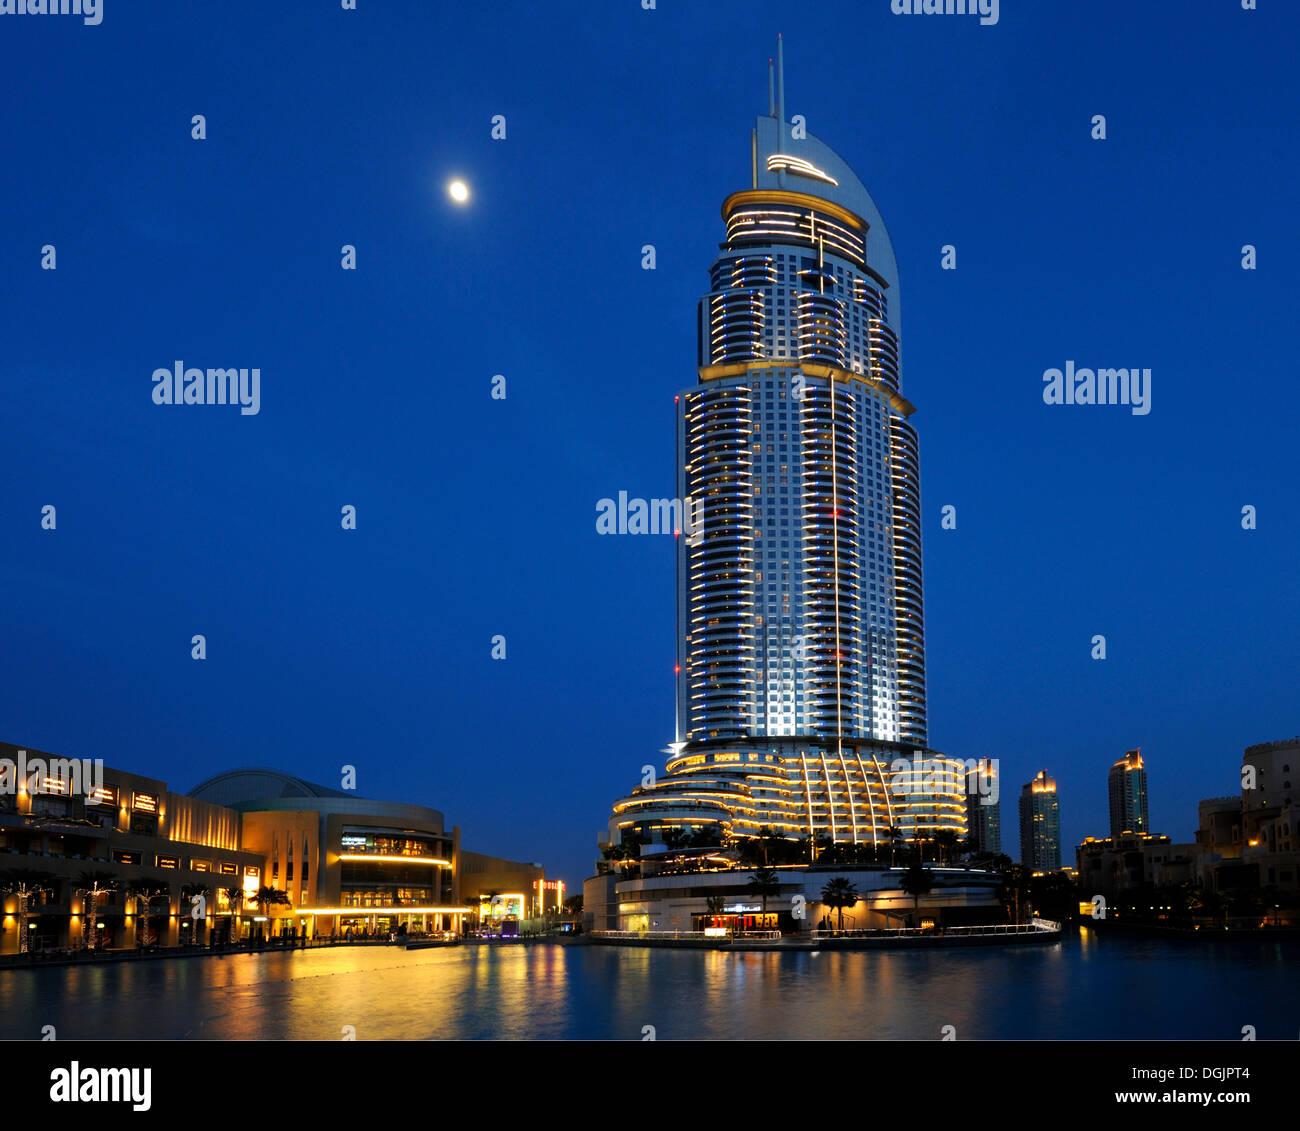 'The Address' luxury hotel, 63 floors, and Dubai Mall at dusk, downtown Dubai, Business Bay, Dubai, United Arab Emirates - Stock Image